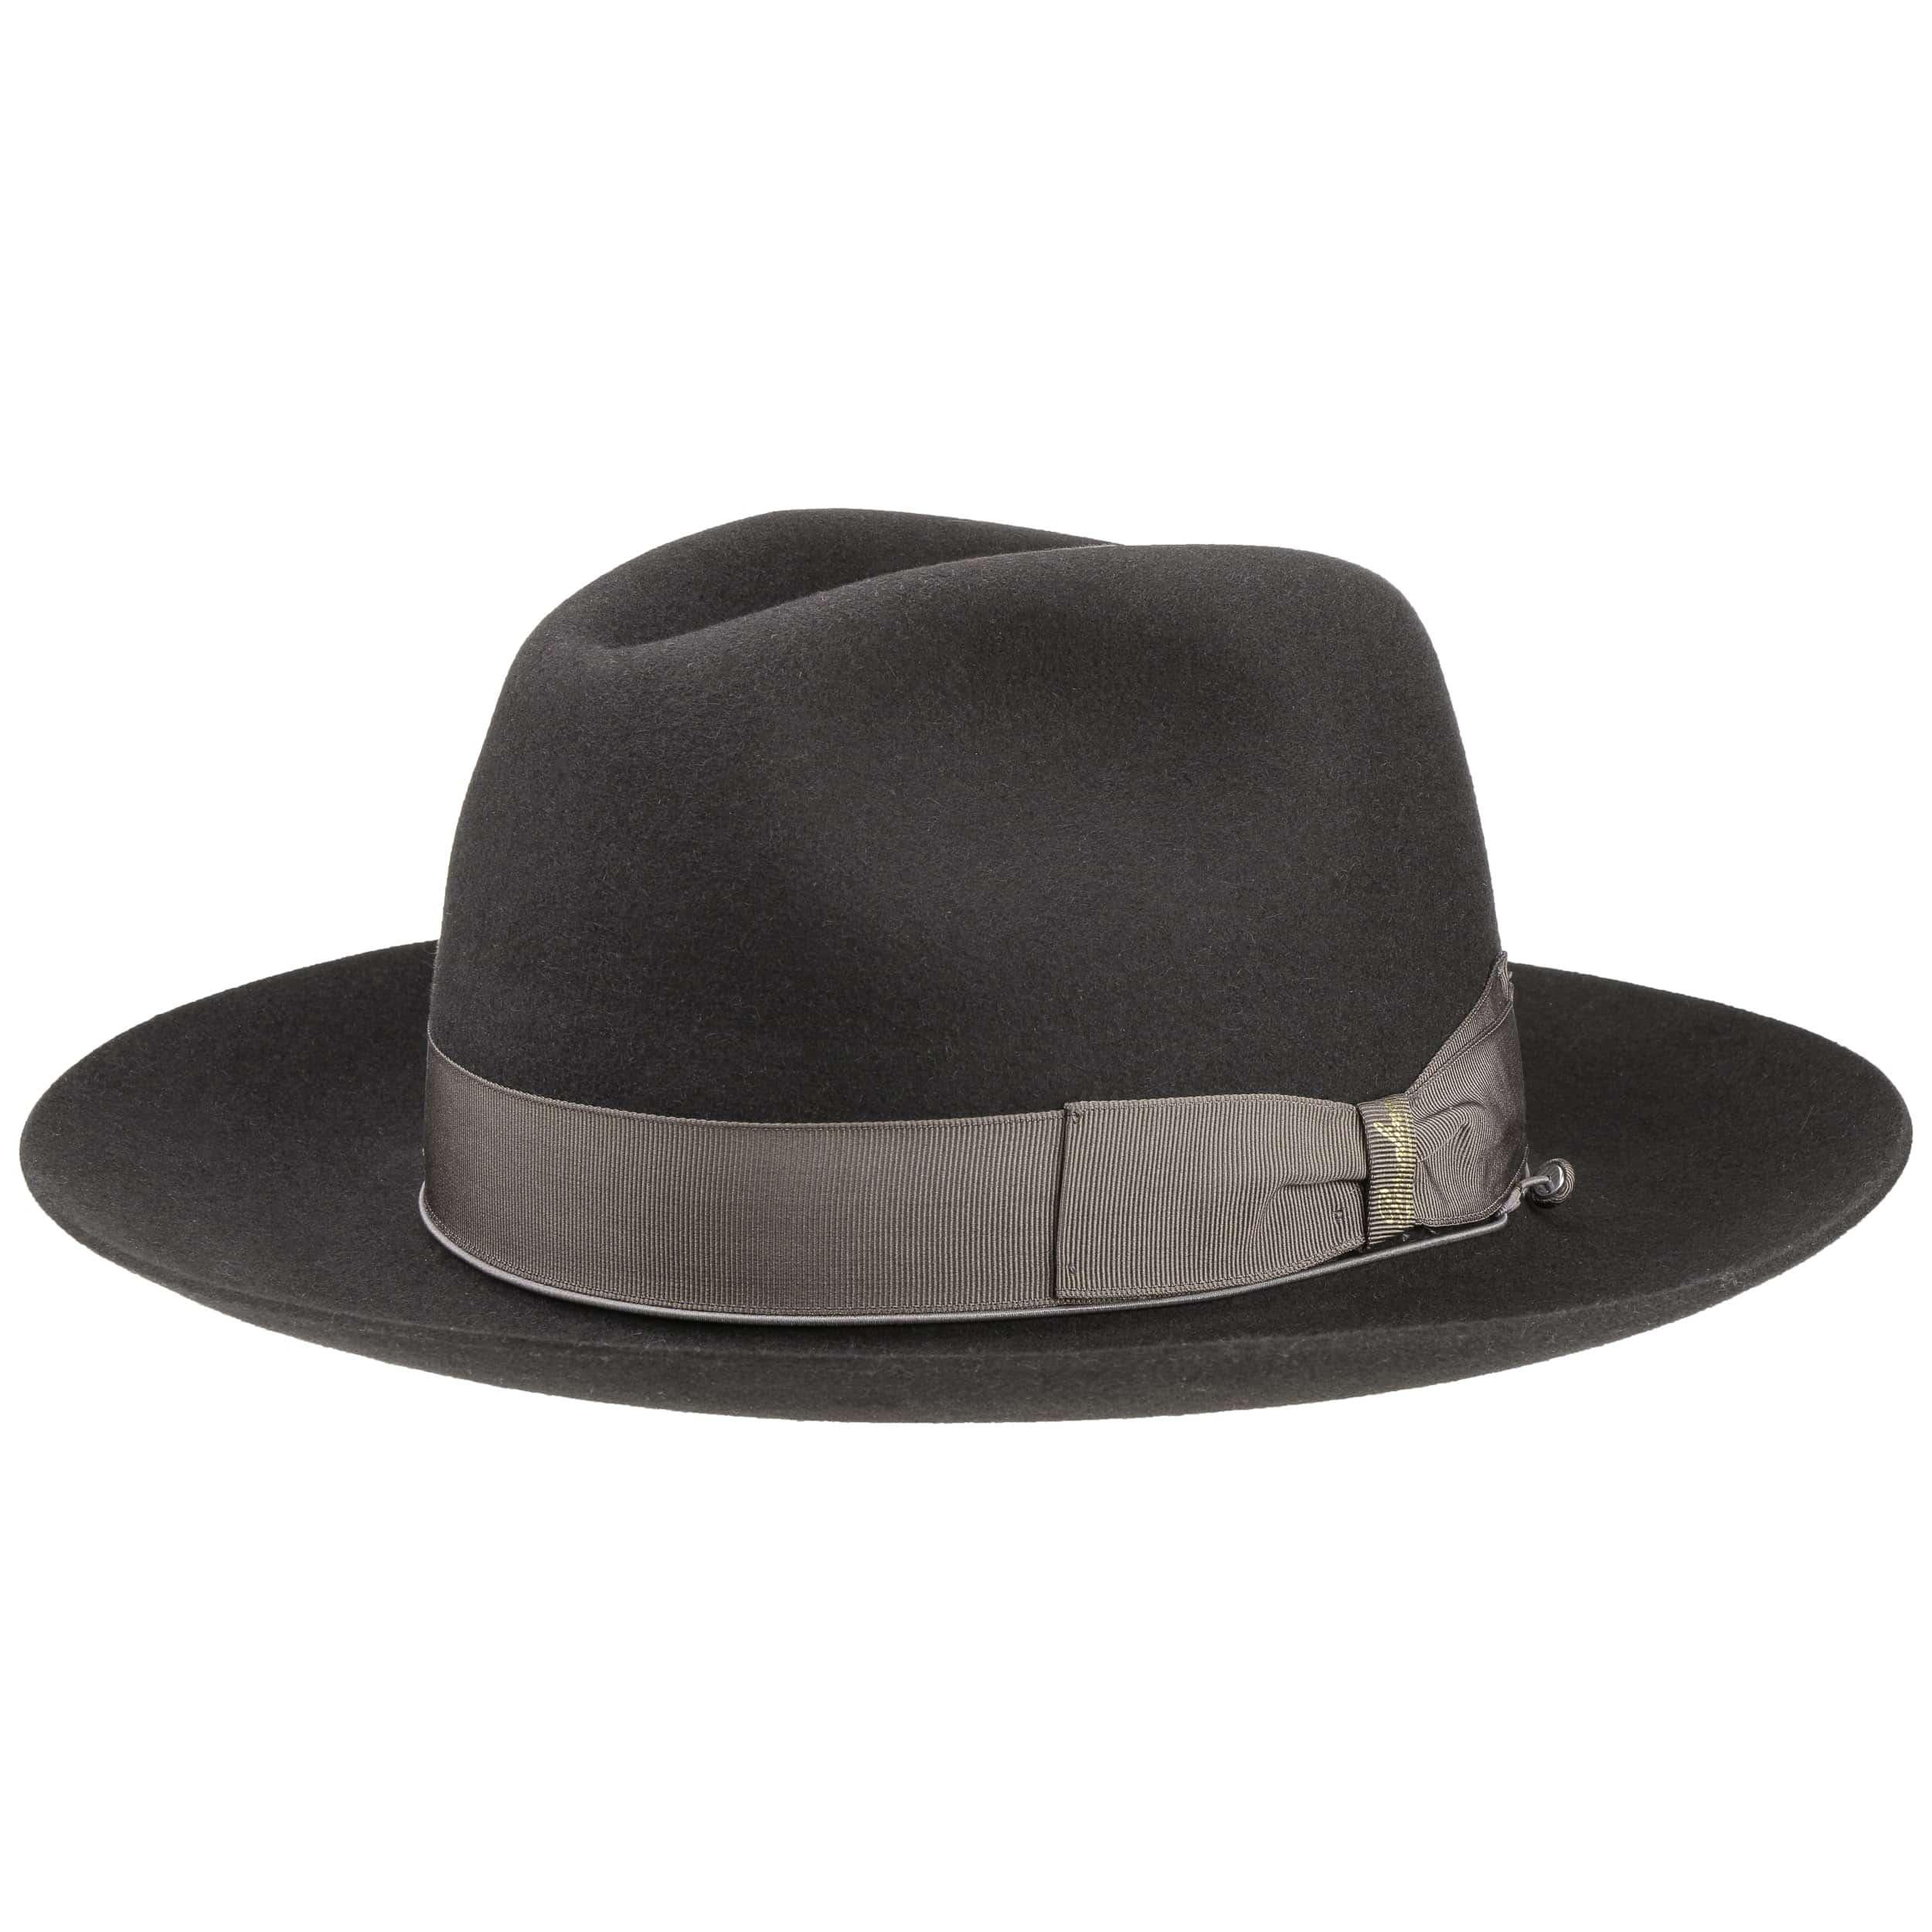 ... Cappello Bogart a Tesa Larga by Borsalino - antracite-grigio 4 ... 4396cf2aa791